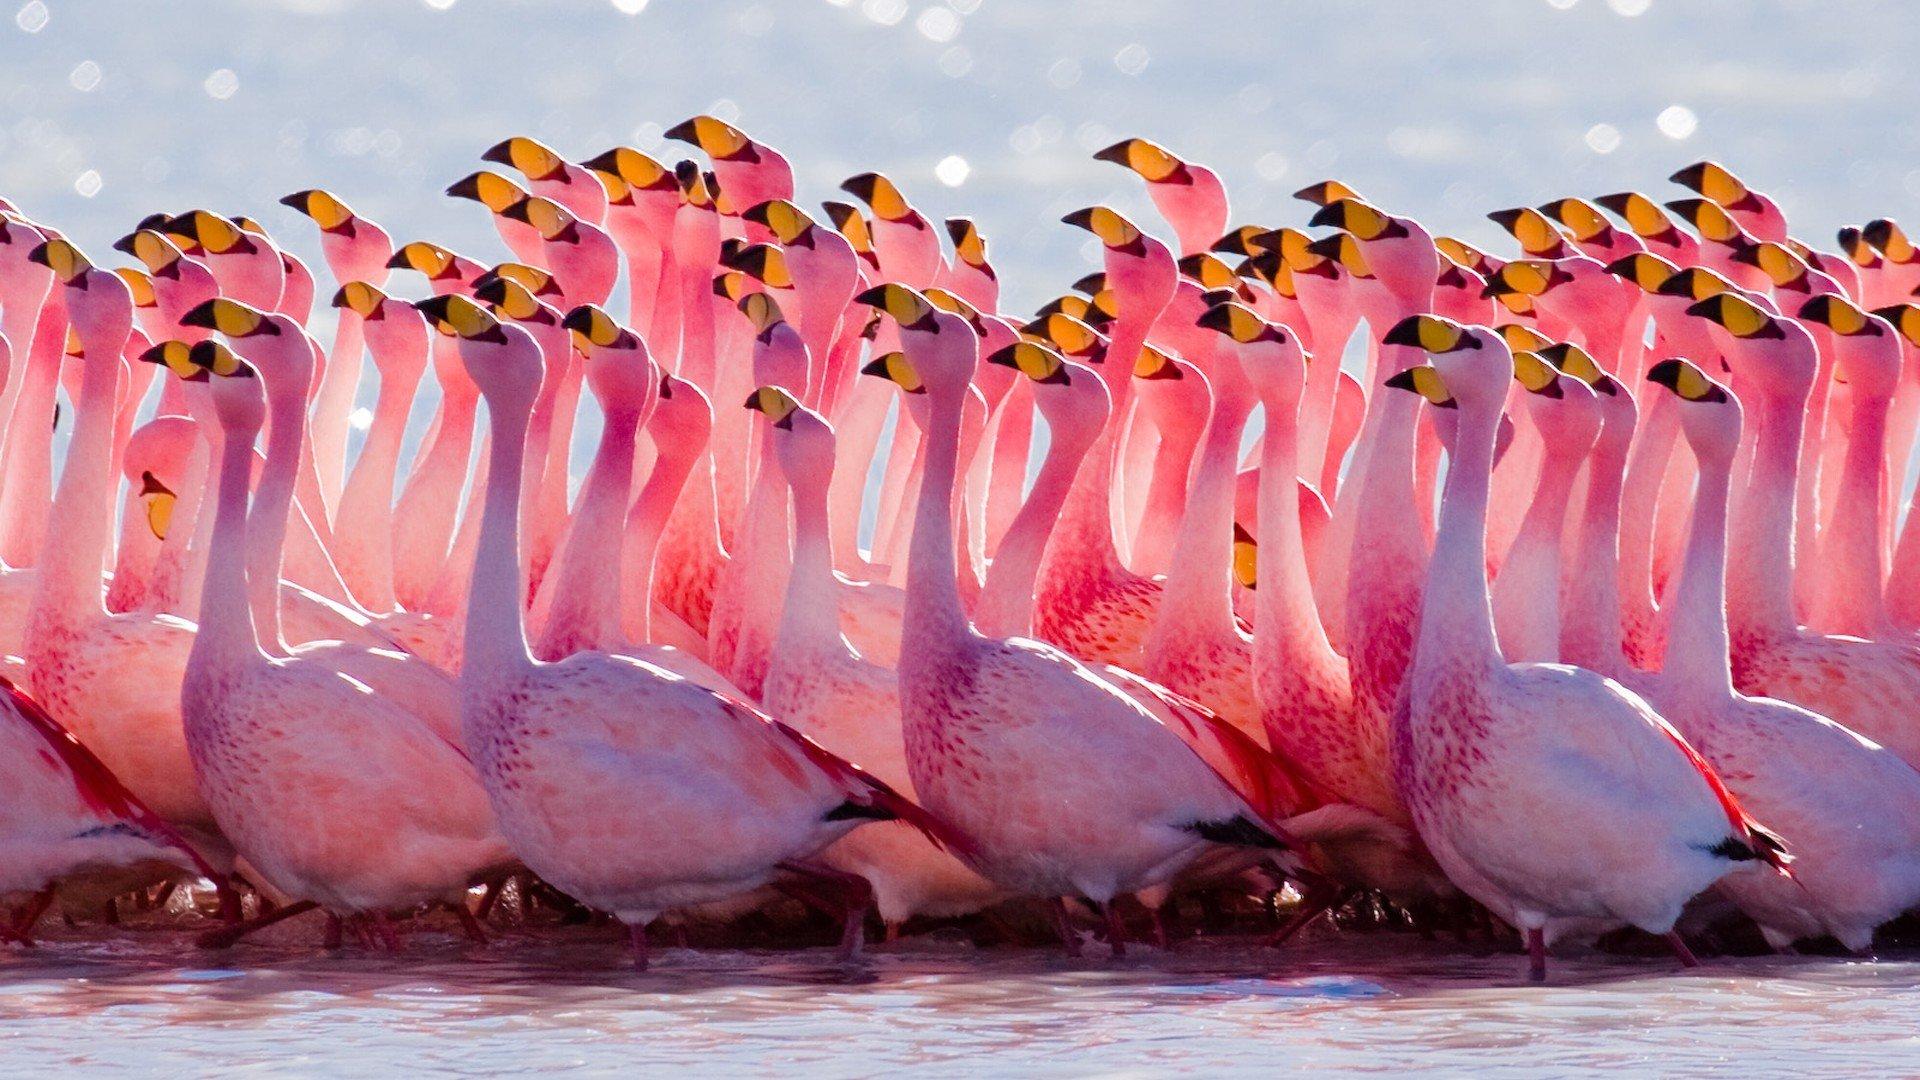 Flamingo Wallpapers 1920x1080 Full Hd 1080p Desktop Backgrounds